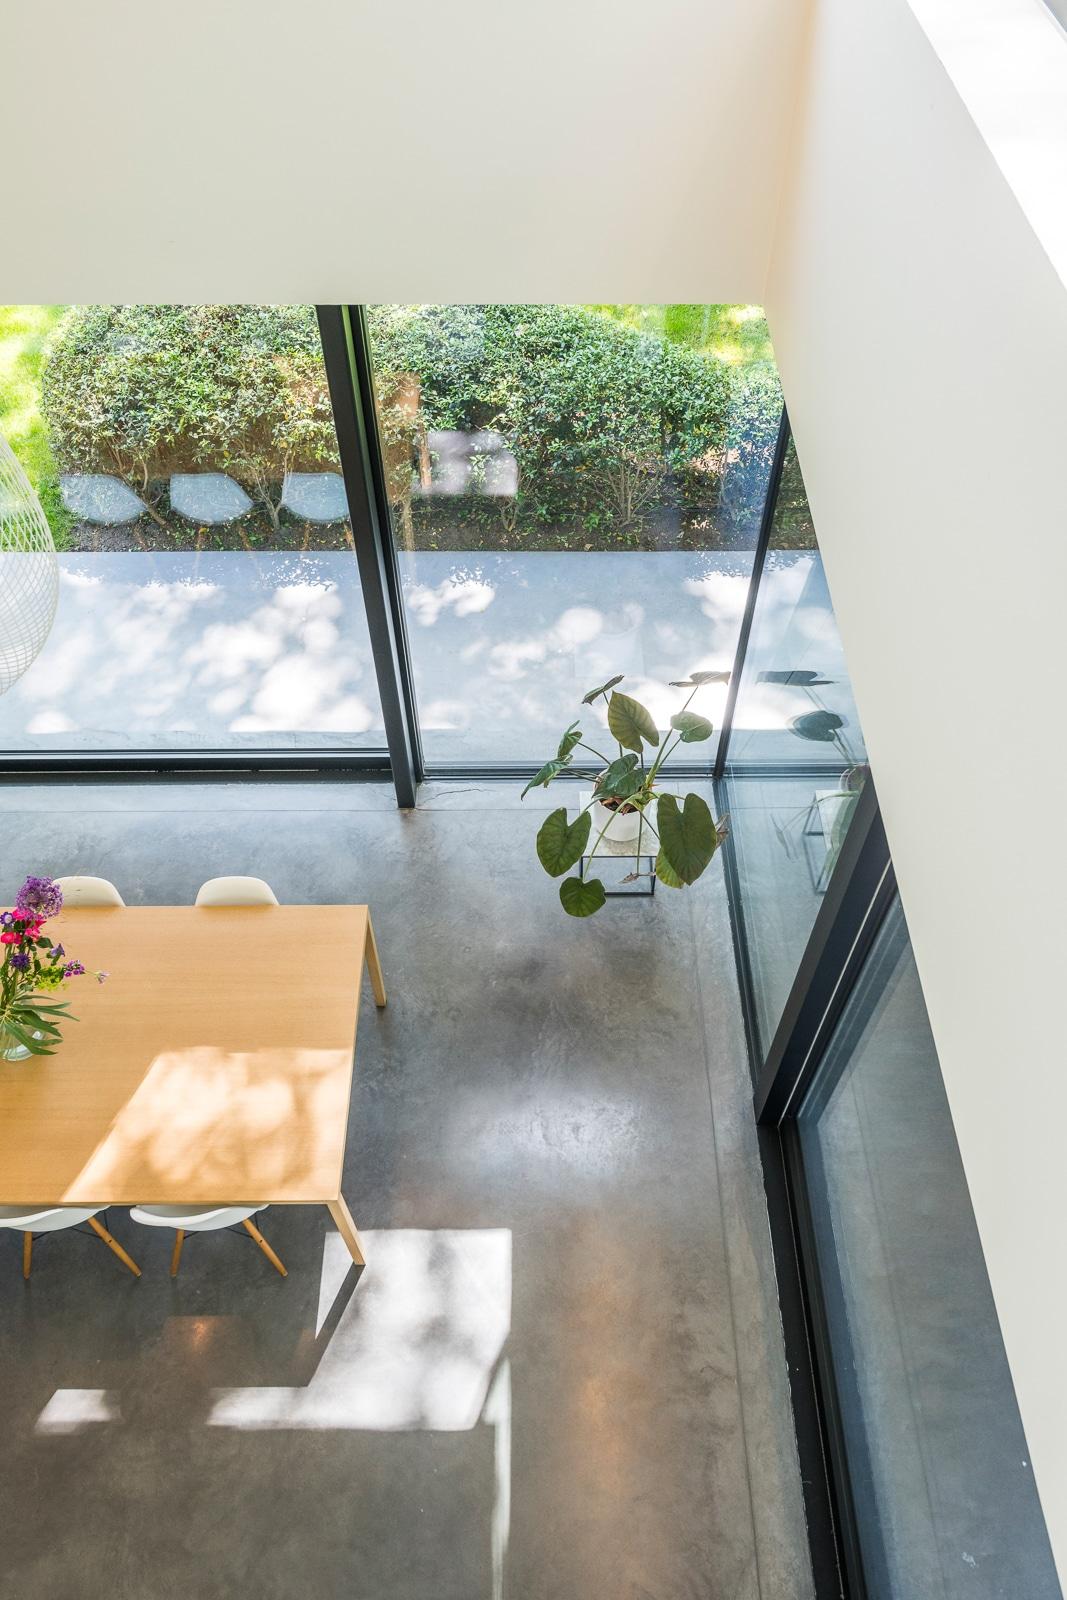 BaeyensBeck Kjell 055web | Baeyens & Beck architecten Gent | architect nieuwbouw renovatie interieur | high end | architectenbureau